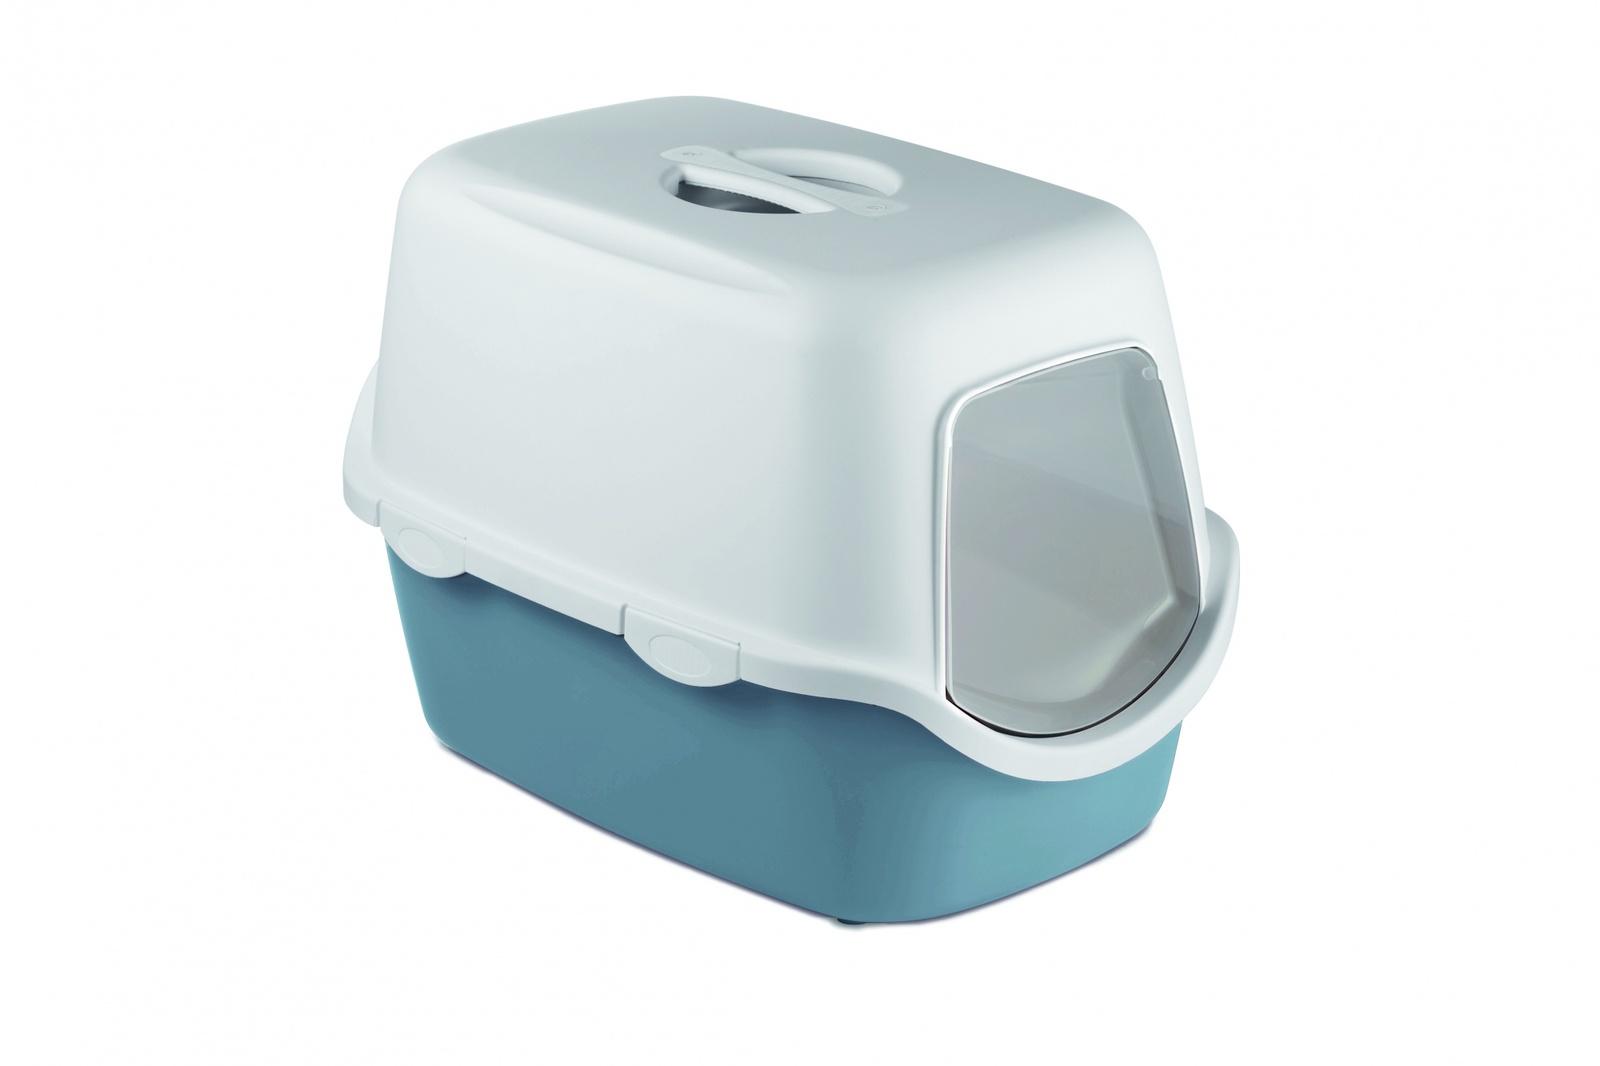 Stefanplast Туалет закрытый Cathy, синий, 56х40х40 см (1,52 кг)